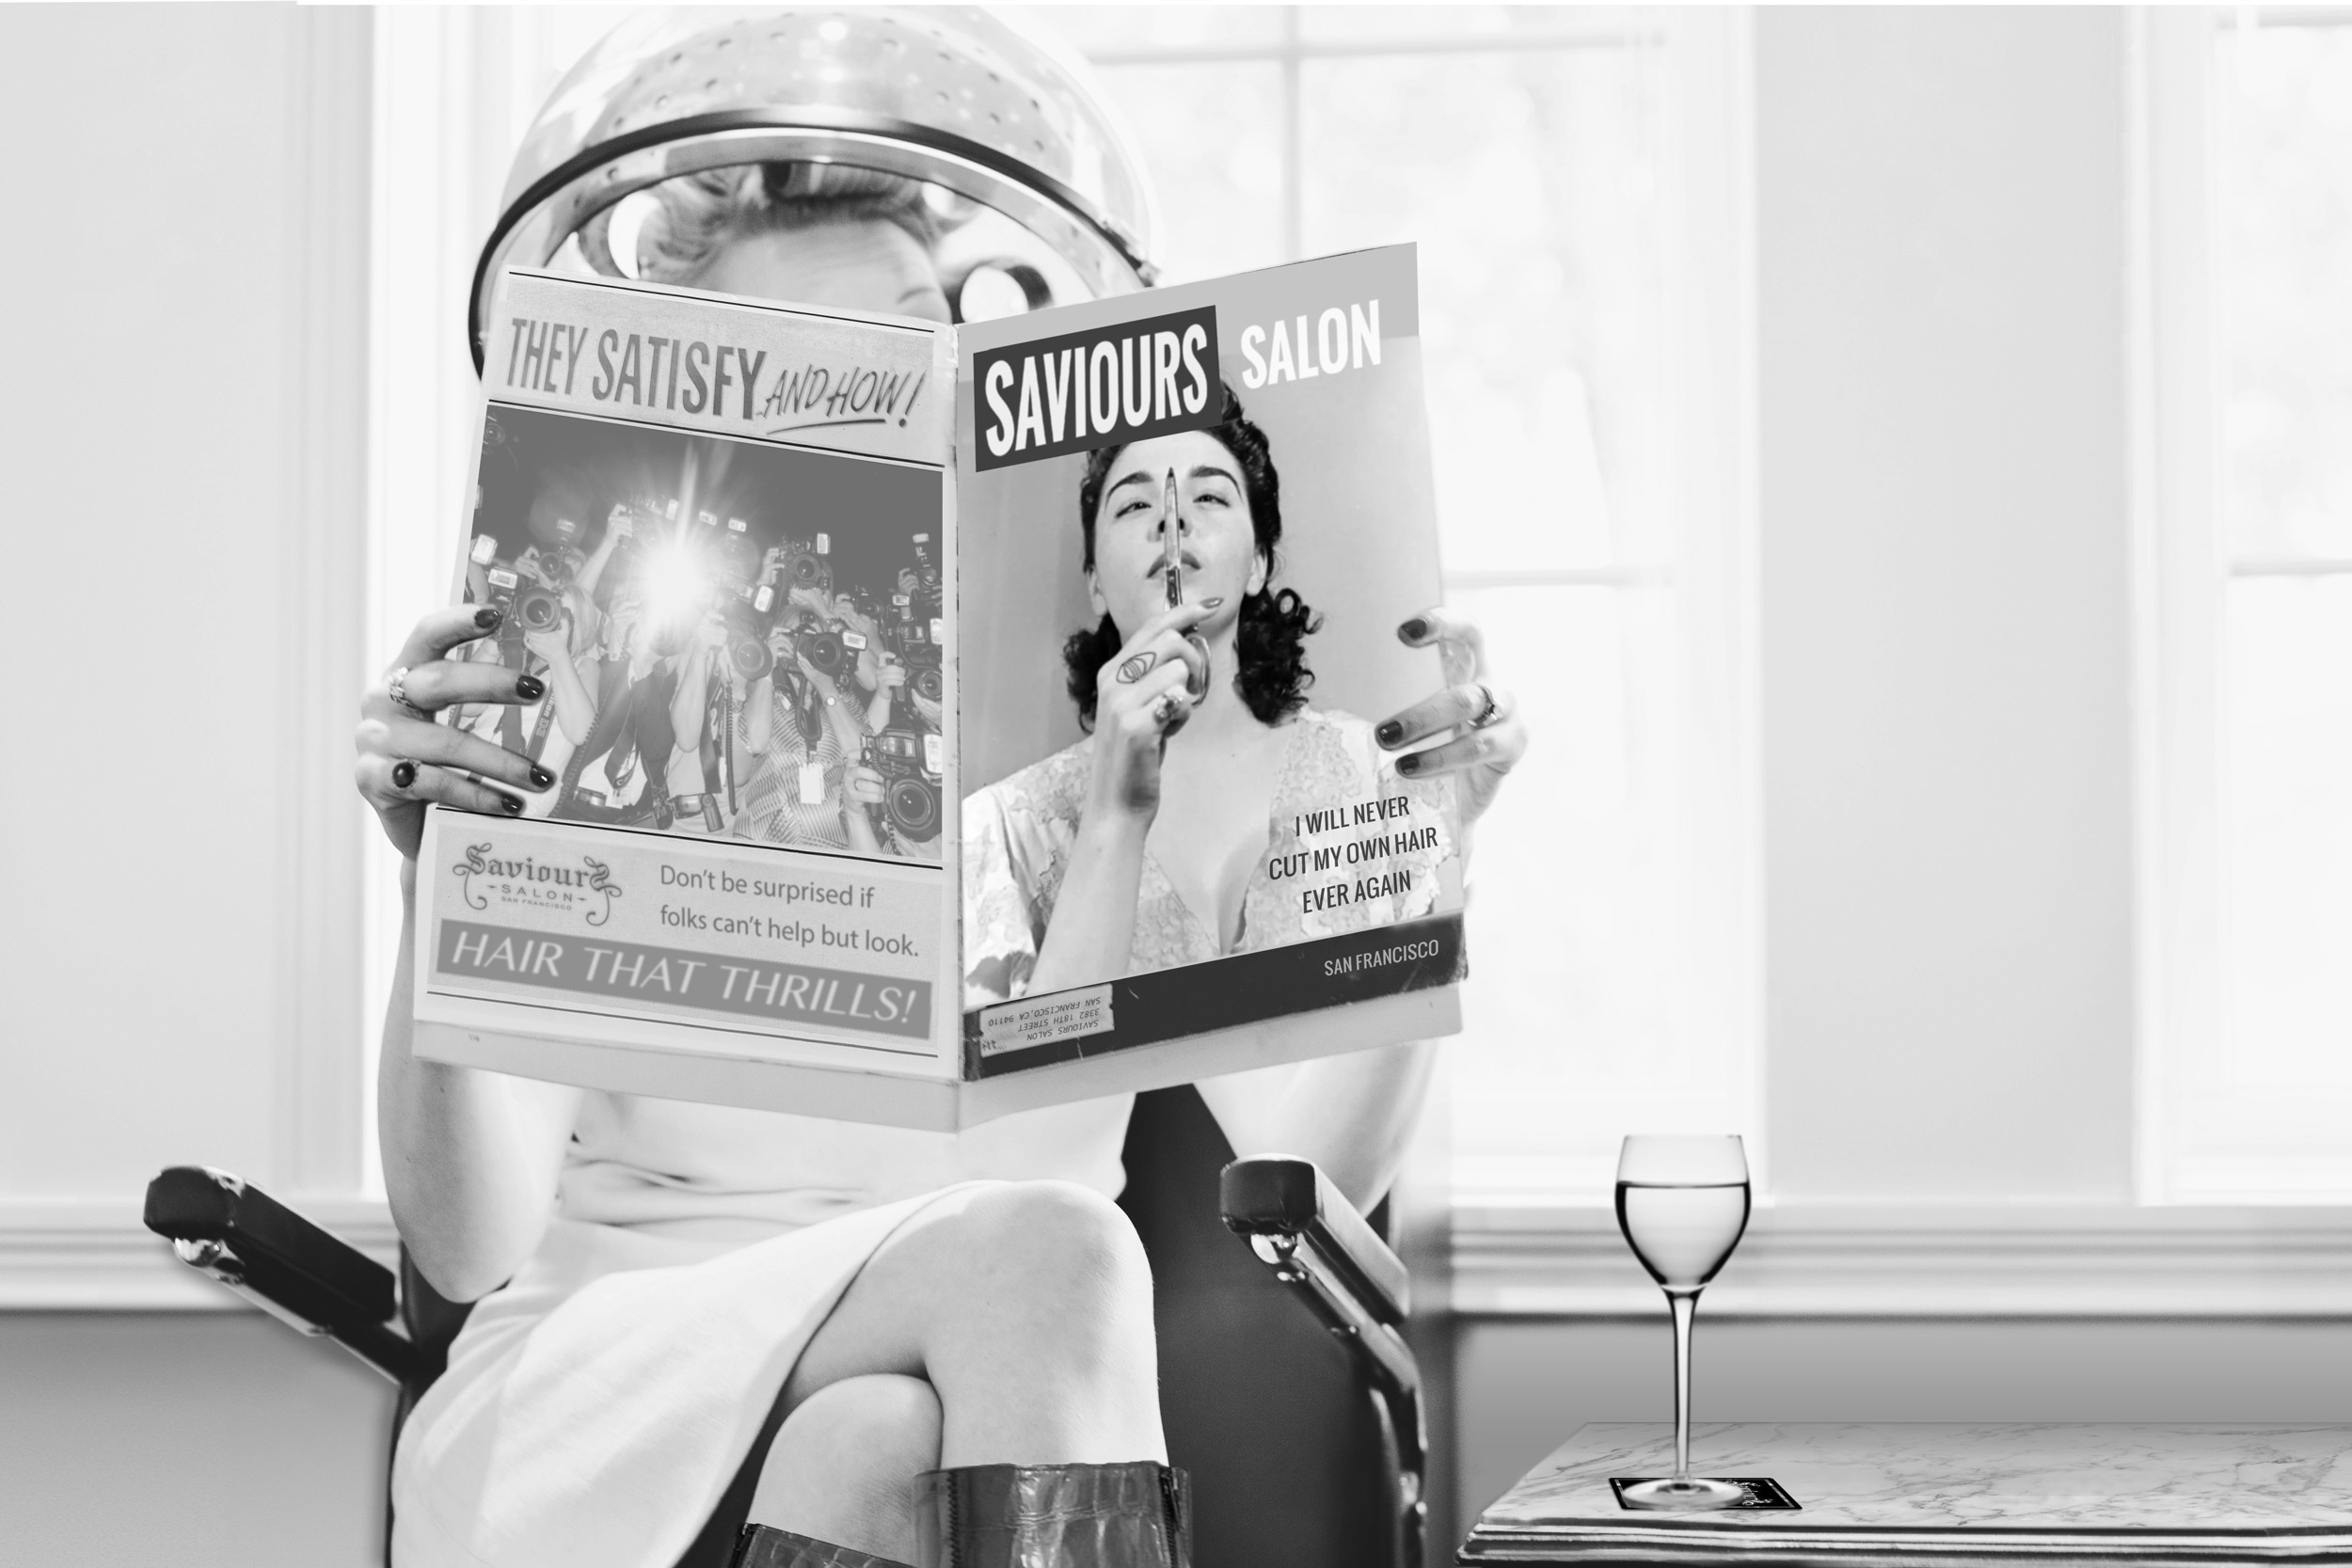 Saviours Salon - Stylists of Hair and Makeup